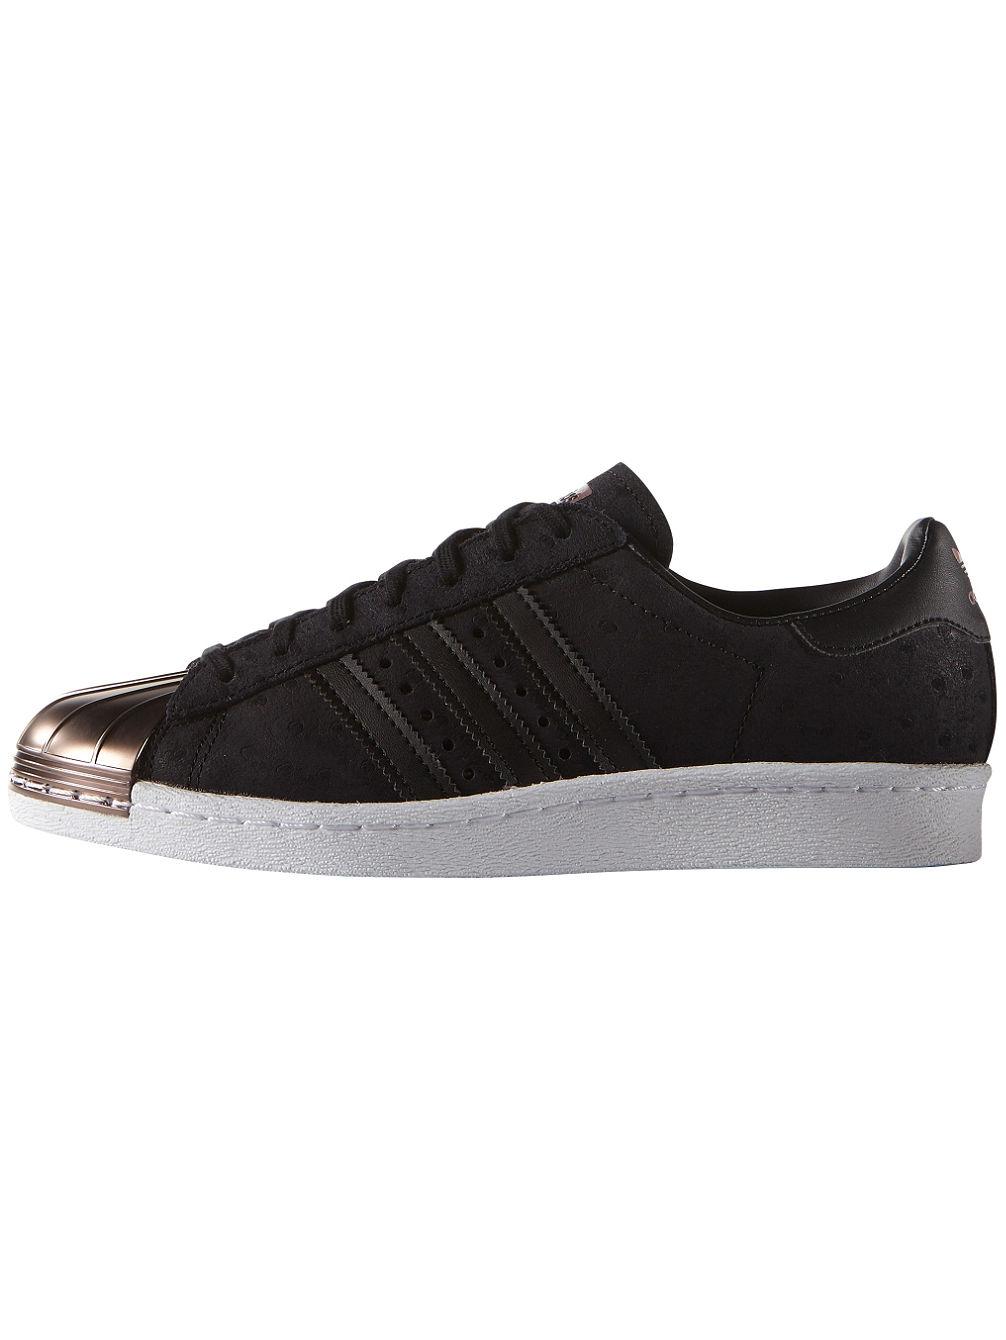 promo code 9876b 38c43 Superstar 80s Metal Toe Tennarit Women. adidas Originals